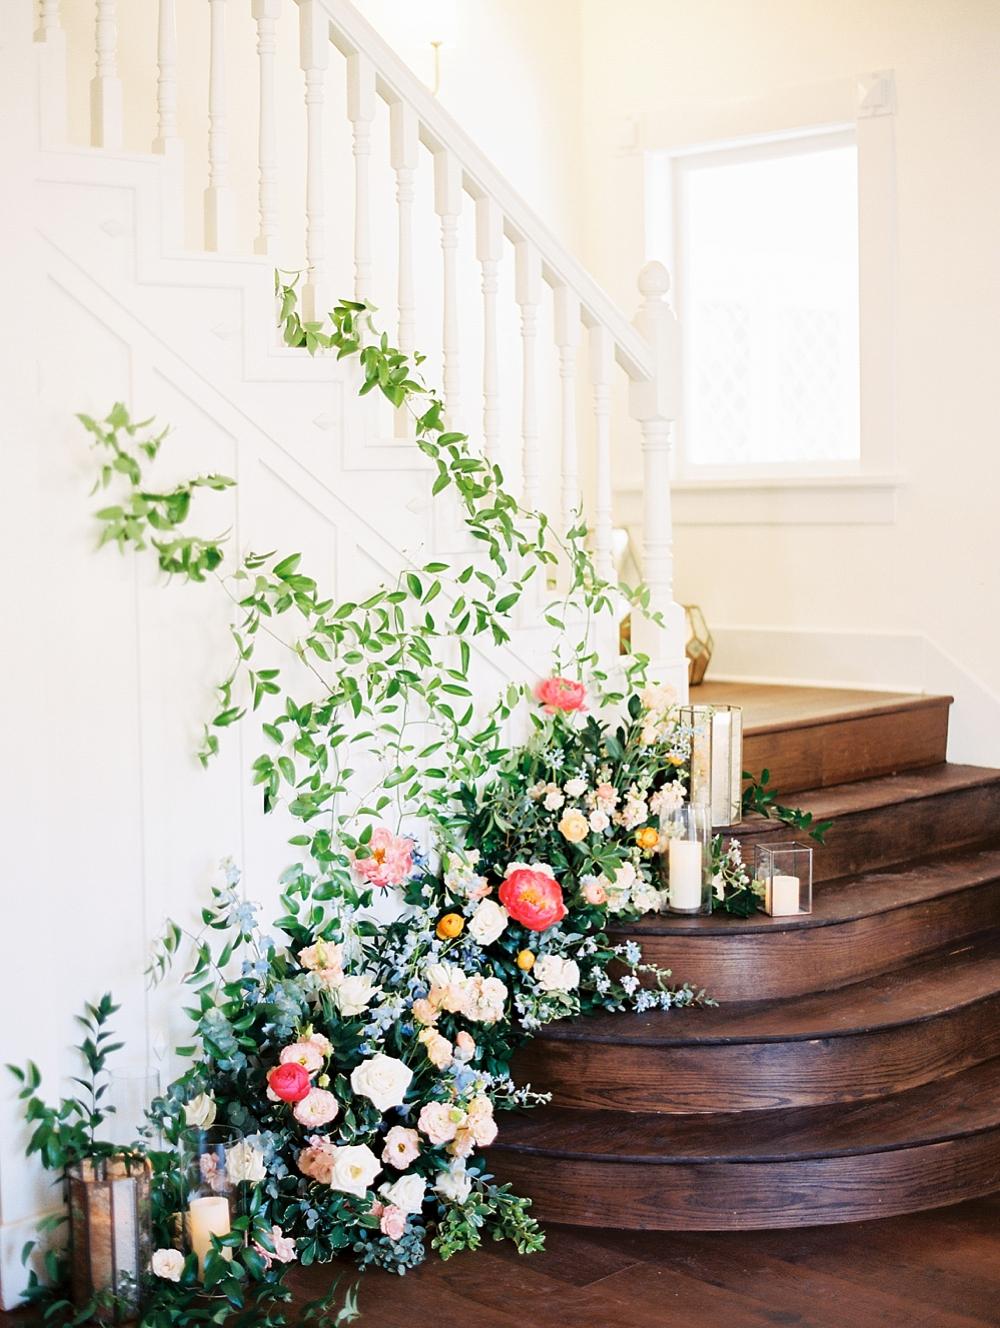 Kristin-La-Voie-Photography-Austin-Wedding-Photographer-the-grand-lady-1